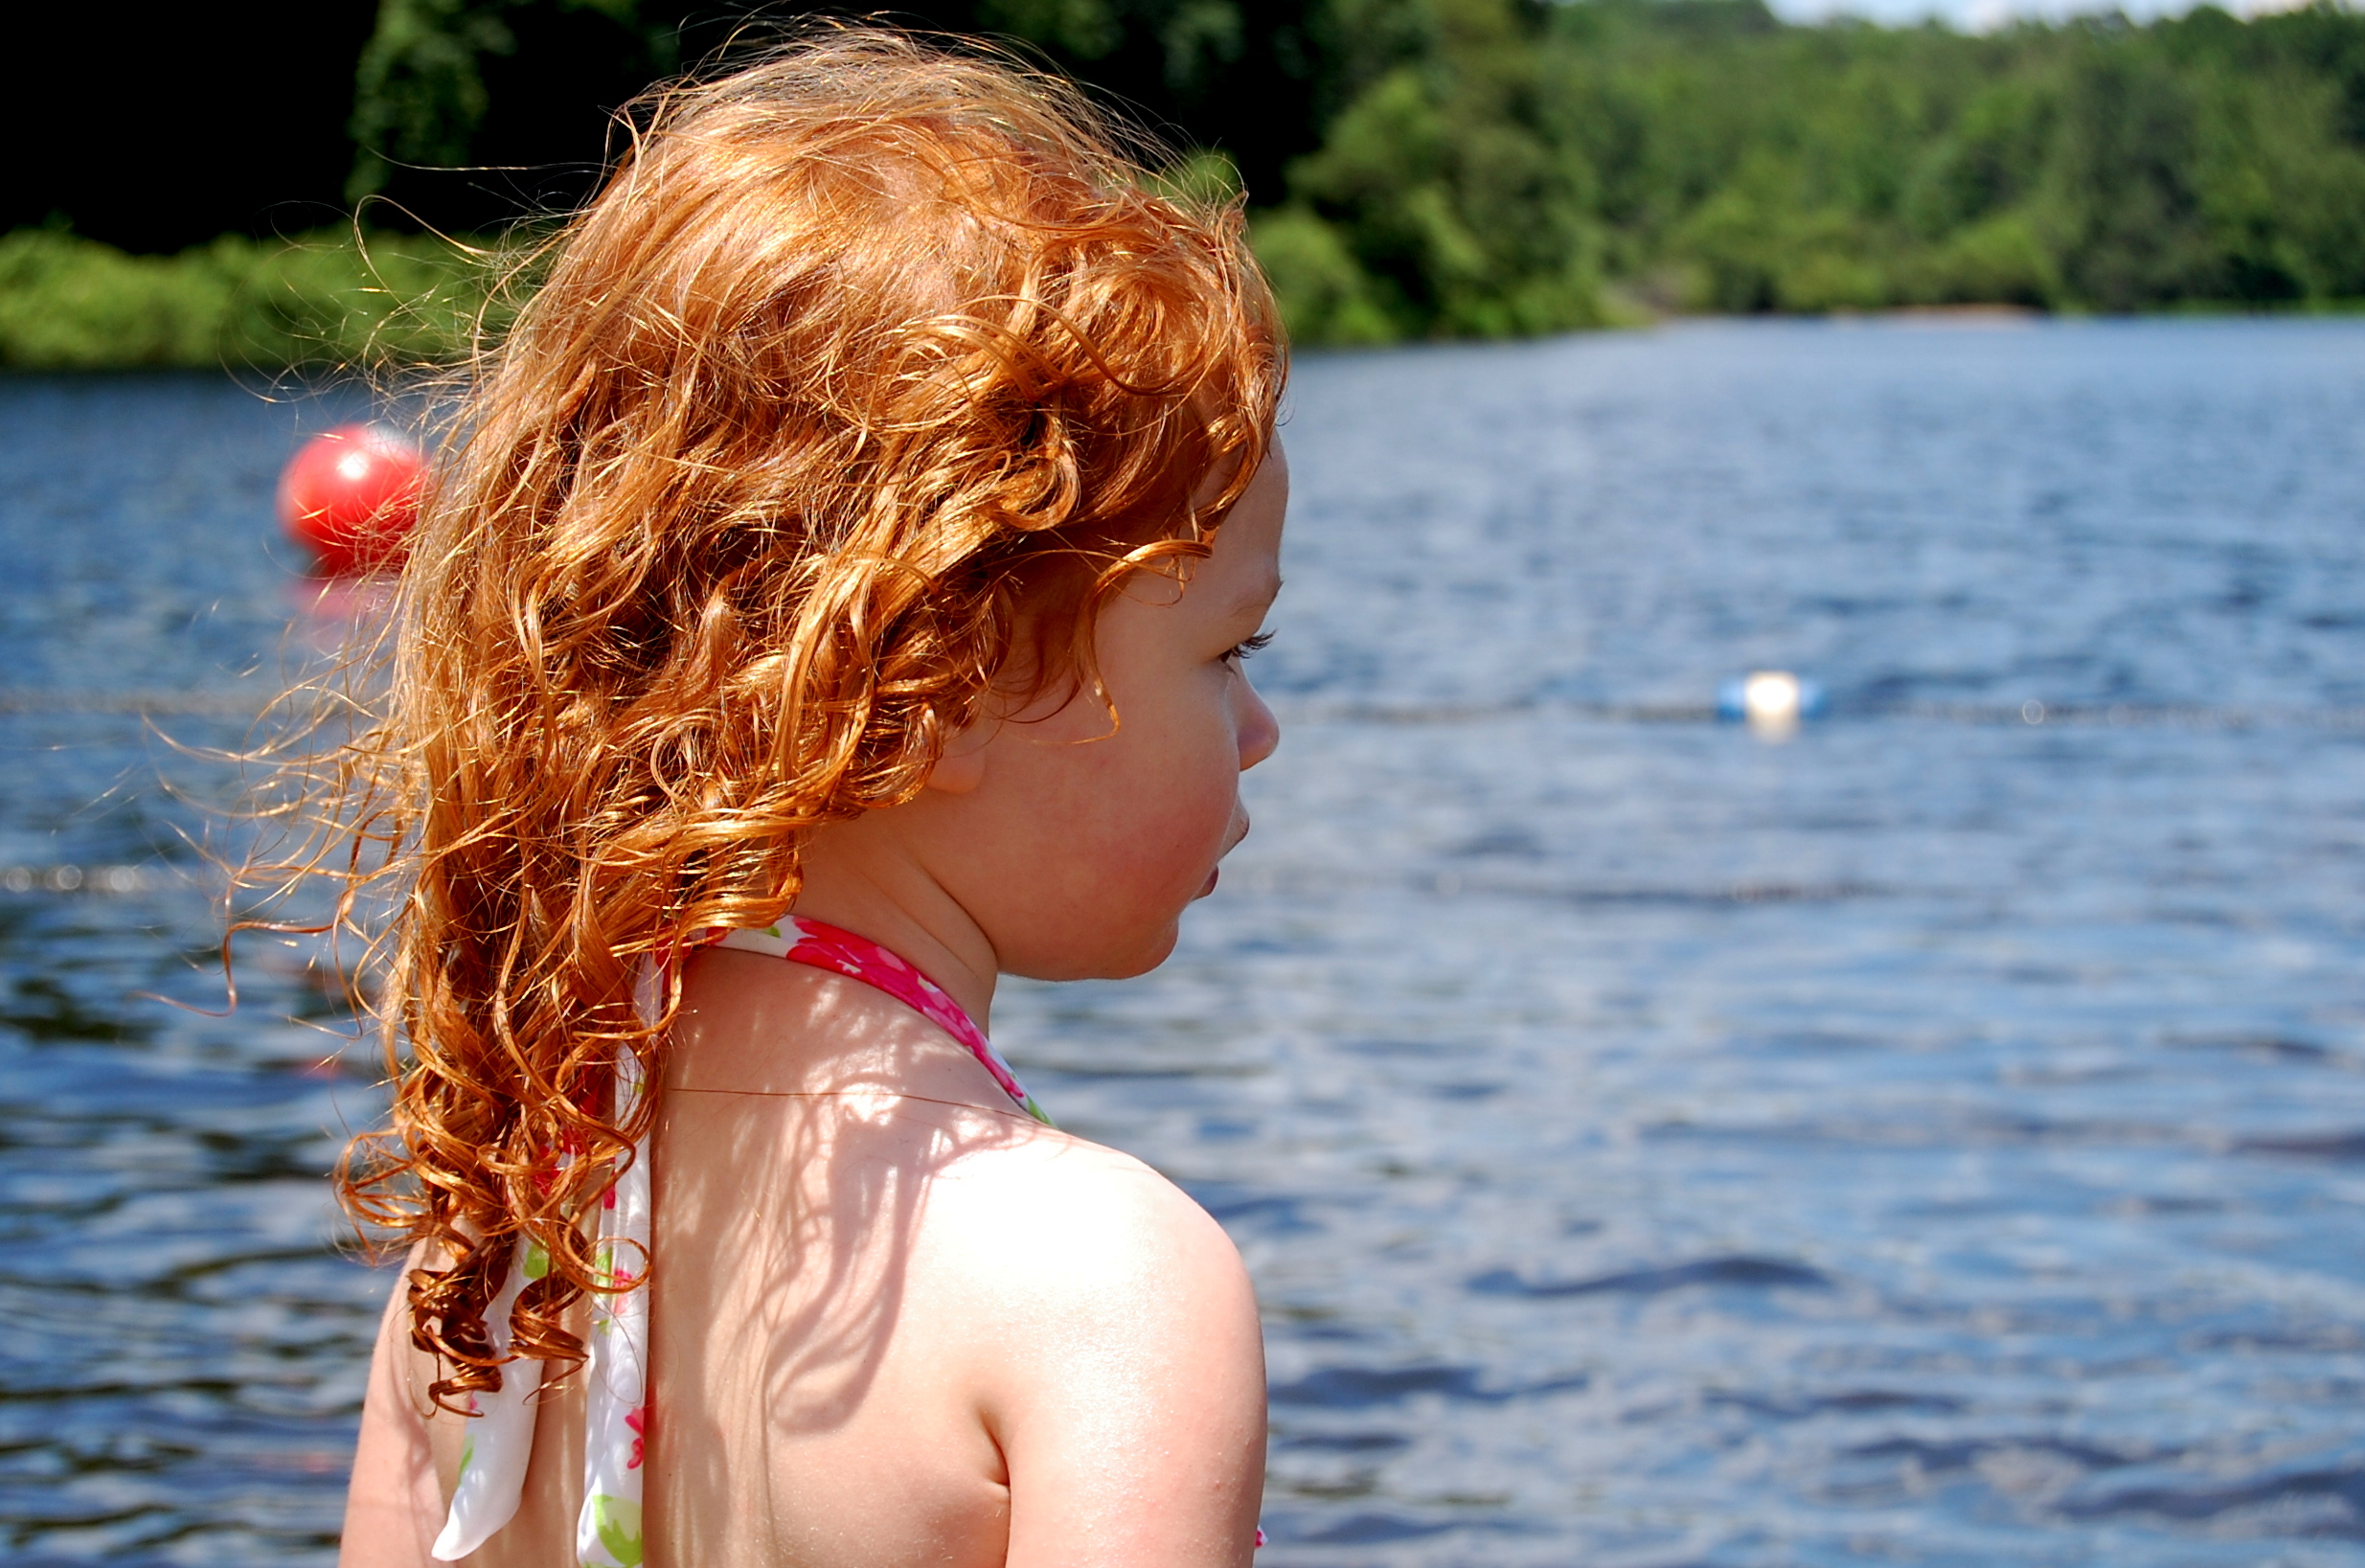 Redhead lake il body...!!! She